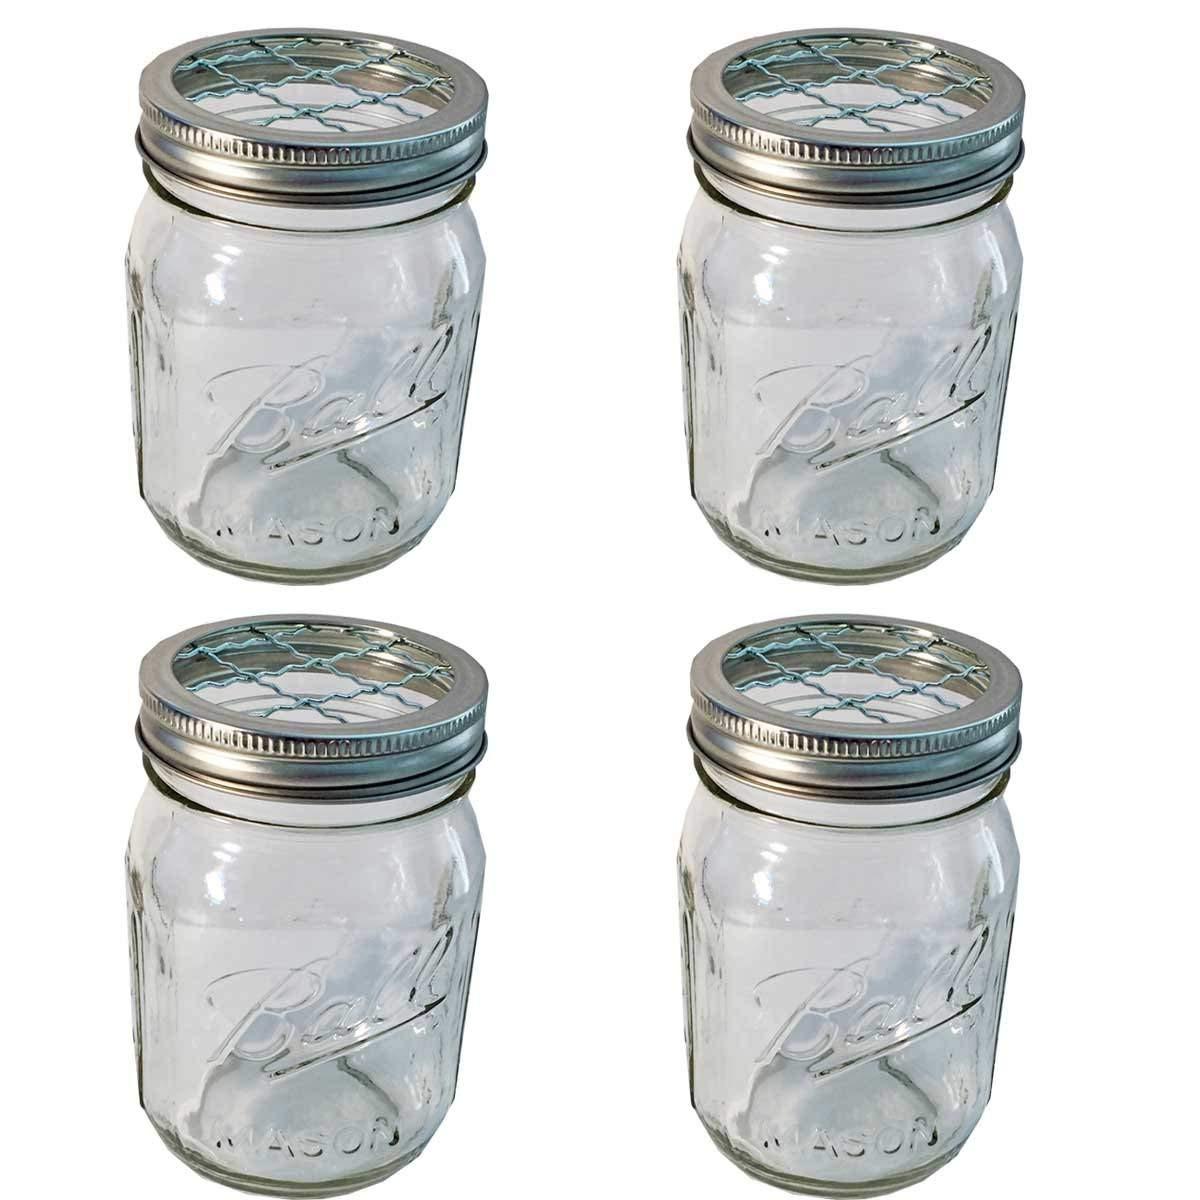 what size mason jar for vase of amazon com 4 mason jars with 4 frog lid inserts regular mouth pint throughout amazon com 4 mason jars with 4 frog lid inserts regular mouth pint 16 oz bundle clear kitchen dining